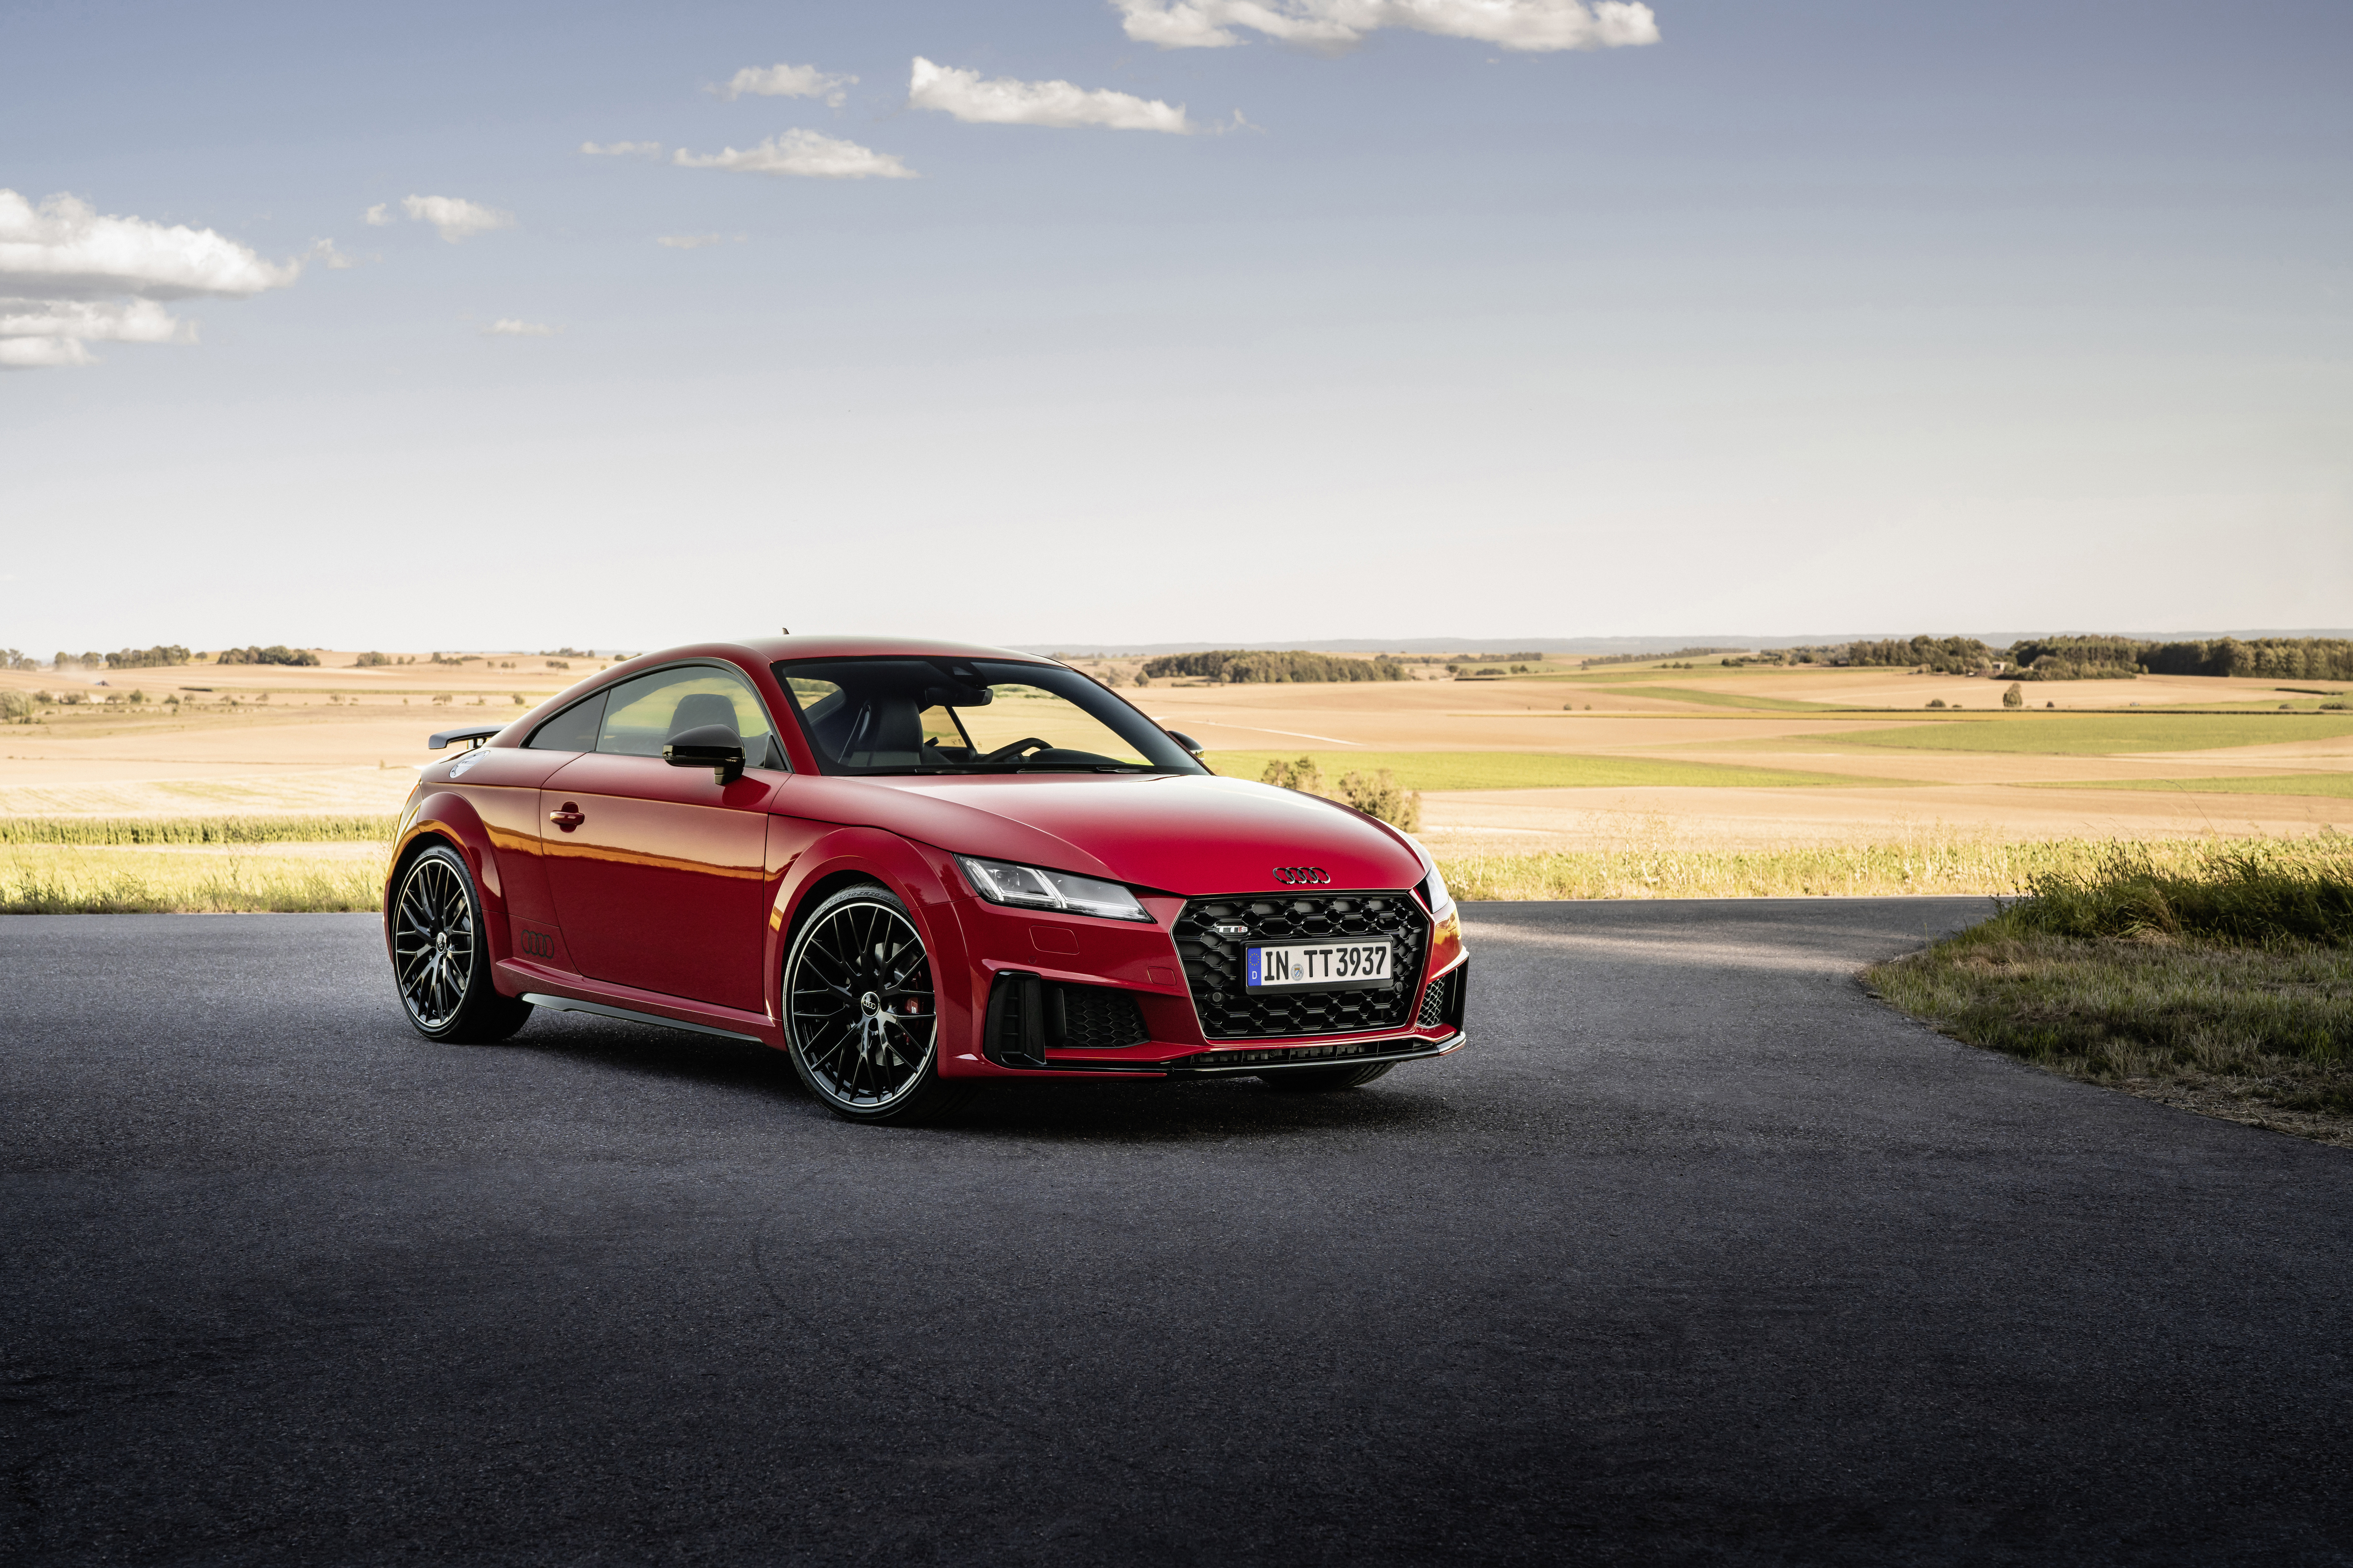 audi tts competition plus coupe 4k 1608918577 - Audi TTS Competition Plus Coupe 4k - Audi TTS Competition Plus Coupe 4k wallpapers